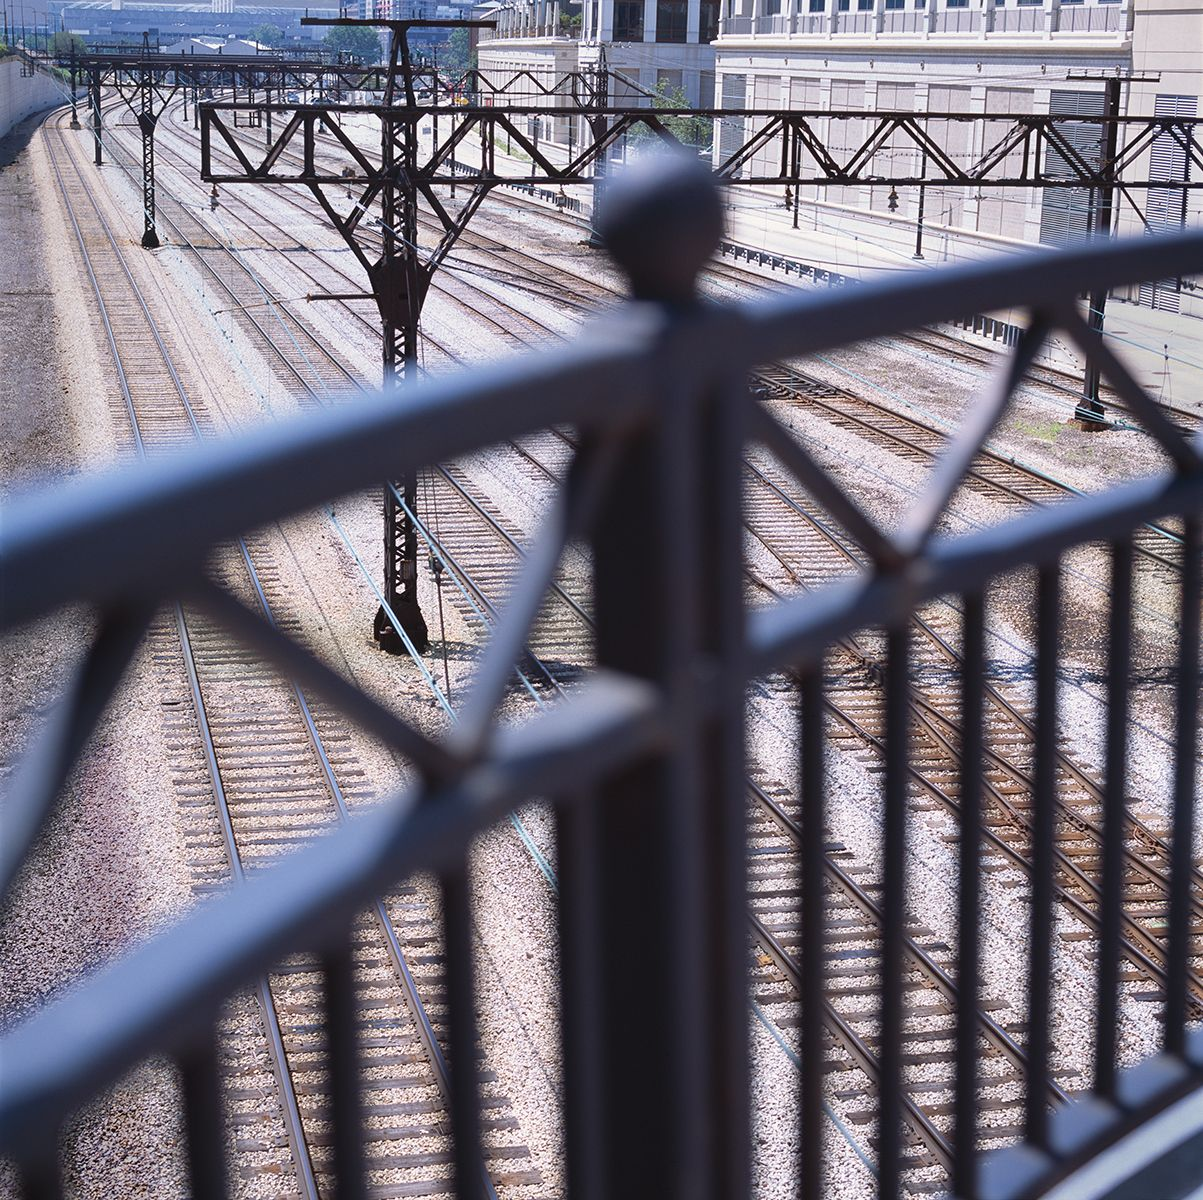 Fence & RR Tracks copy.jpg